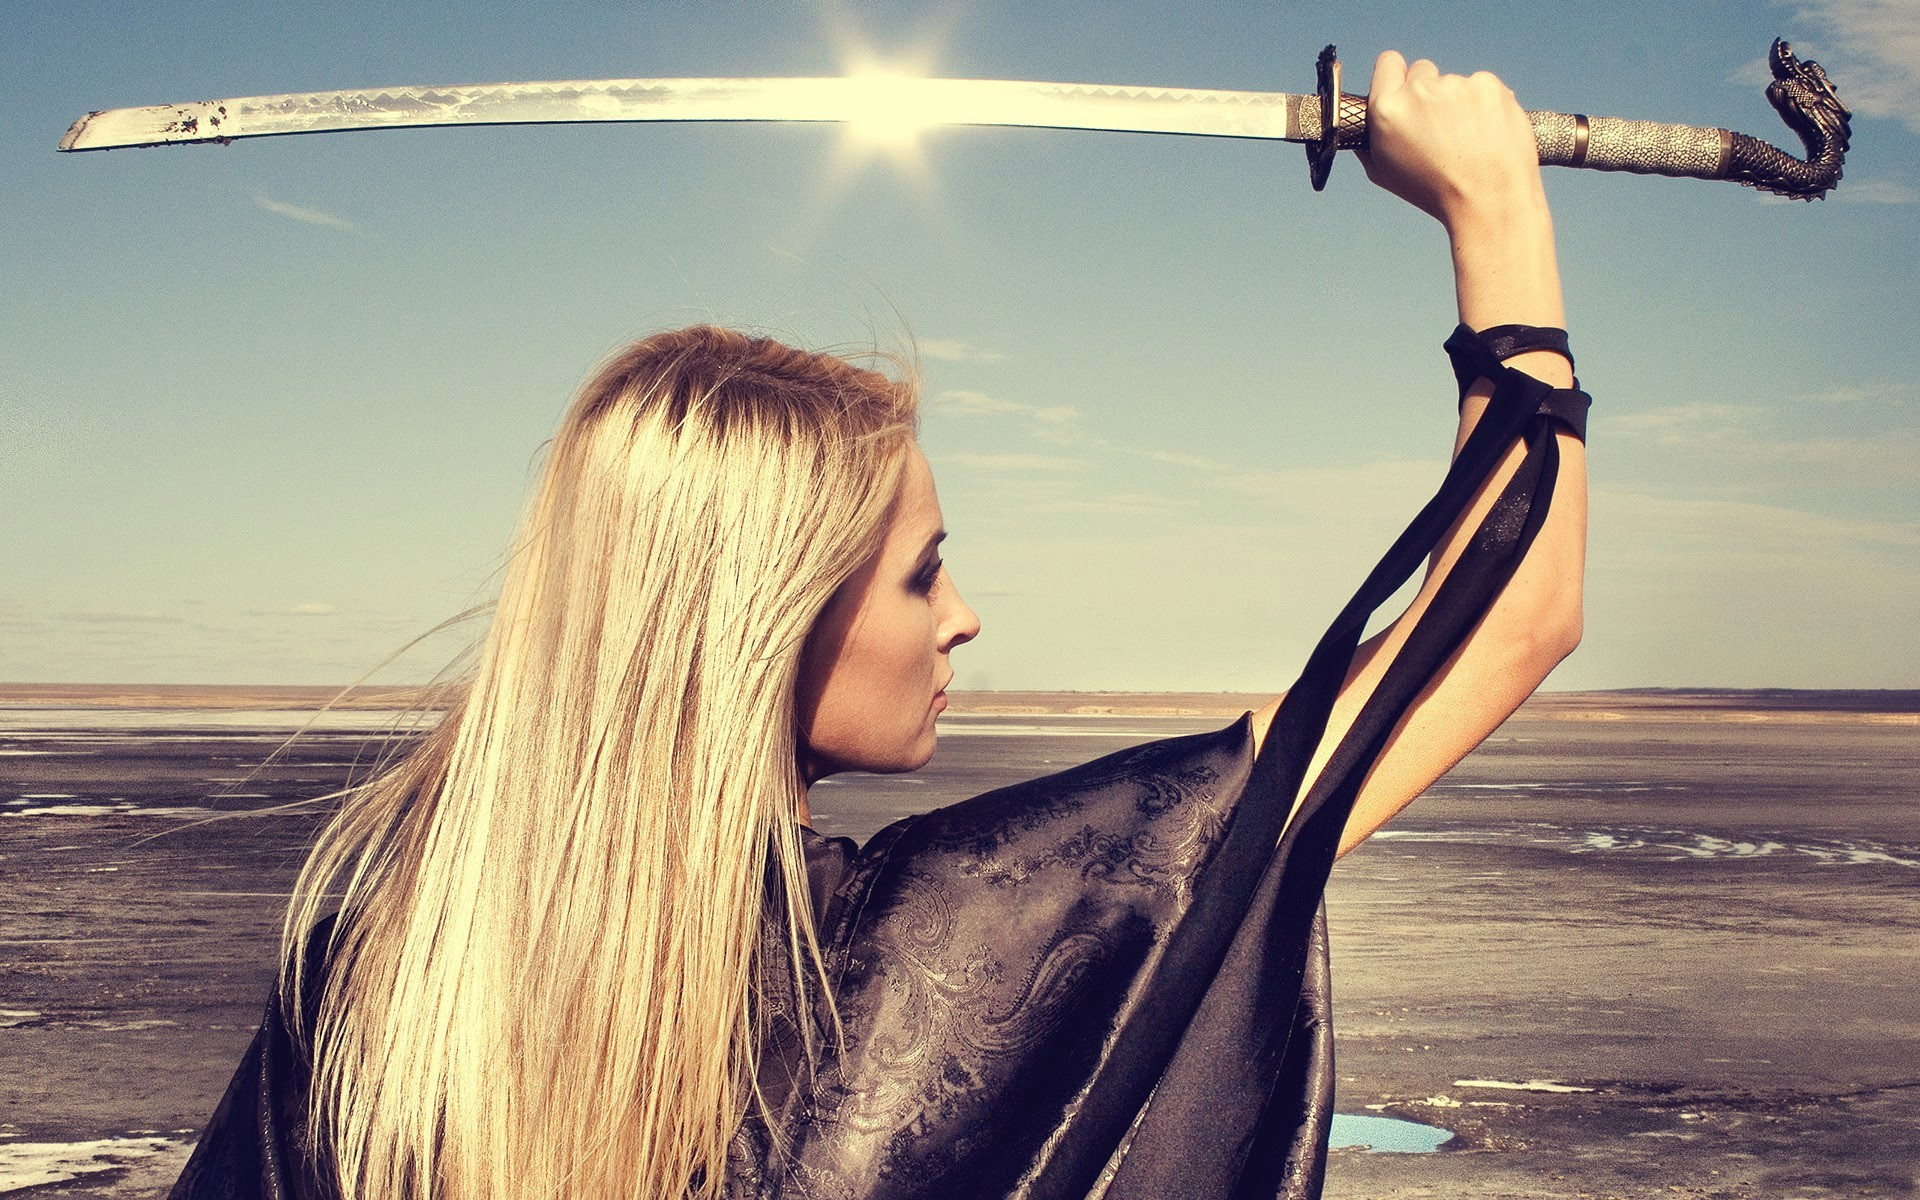 People 1920x1200 women katana sword samurai blonde